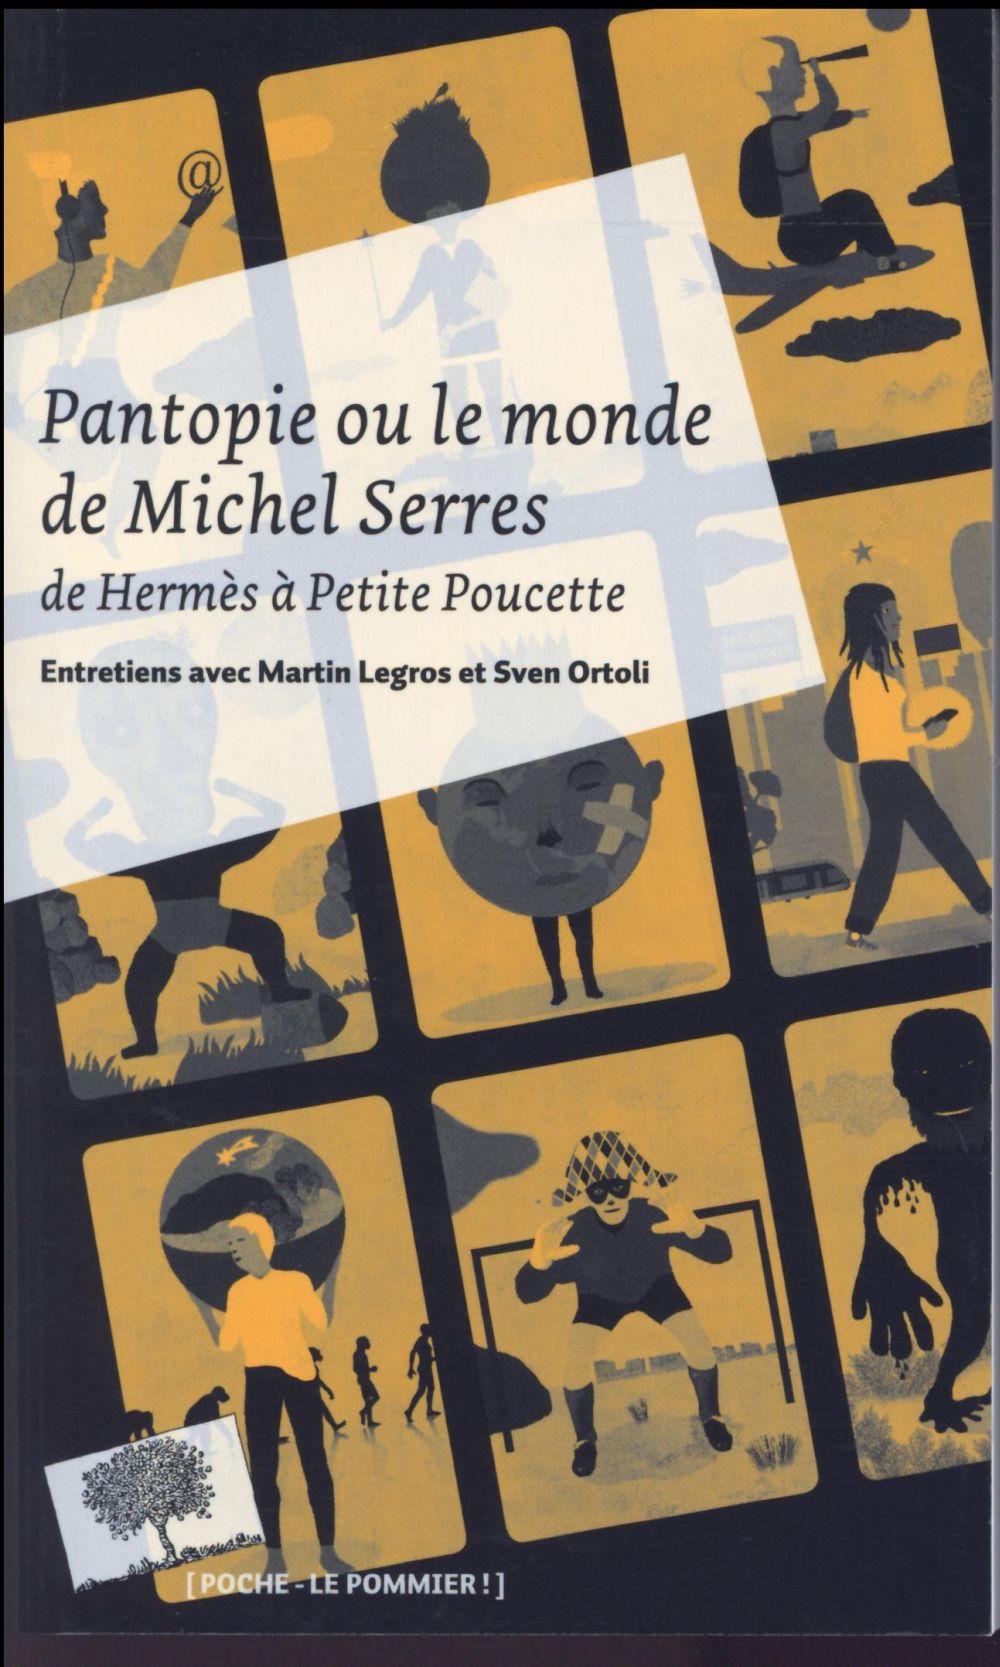 Ortoli Sven - PANTOPIE OU LE MONDE DE MICHEL SERRES (POCHE)